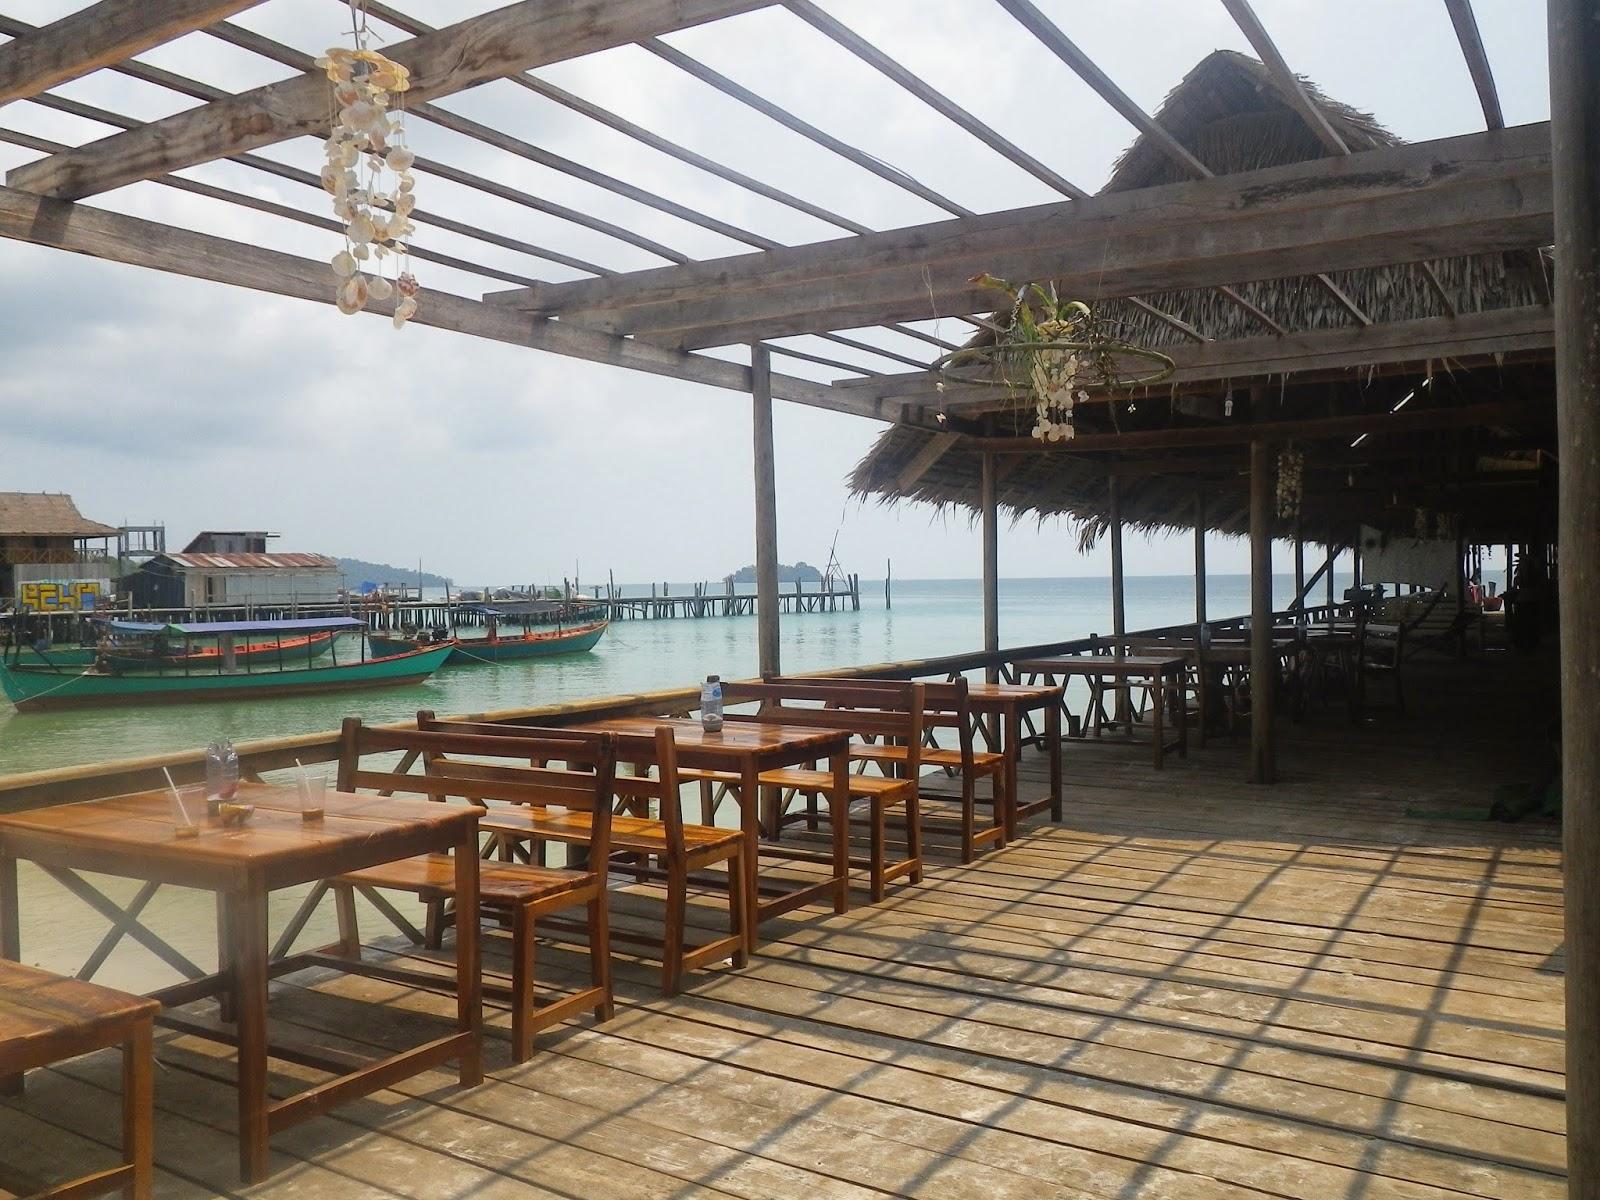 koh-rong-island-cambodia-pier